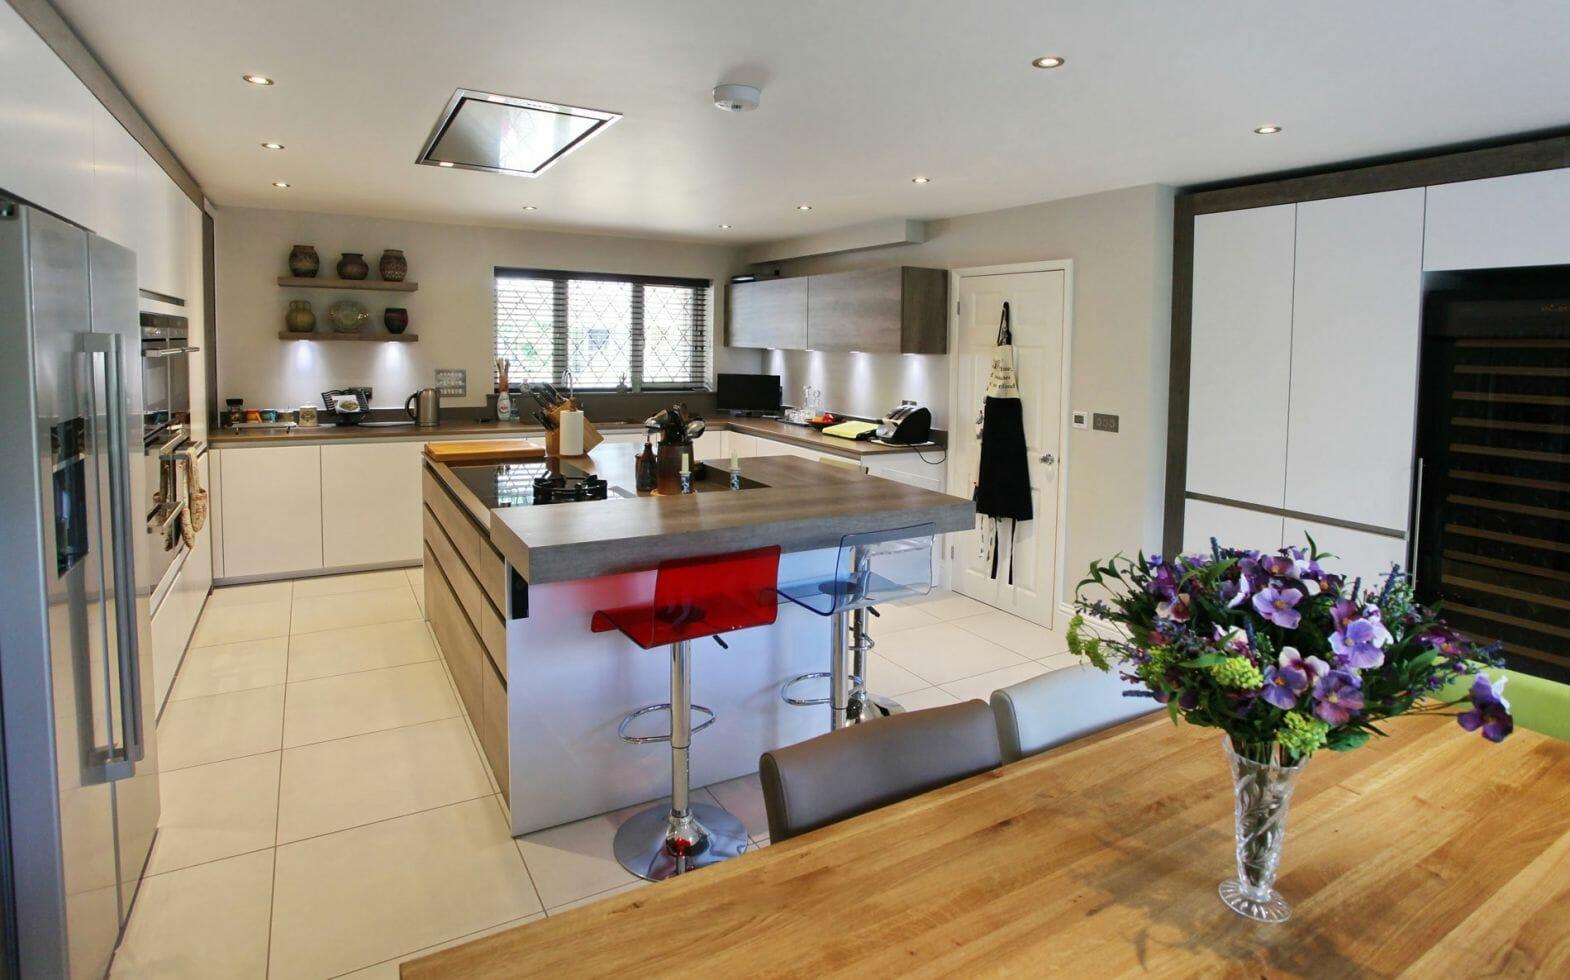 Kitchen example 1